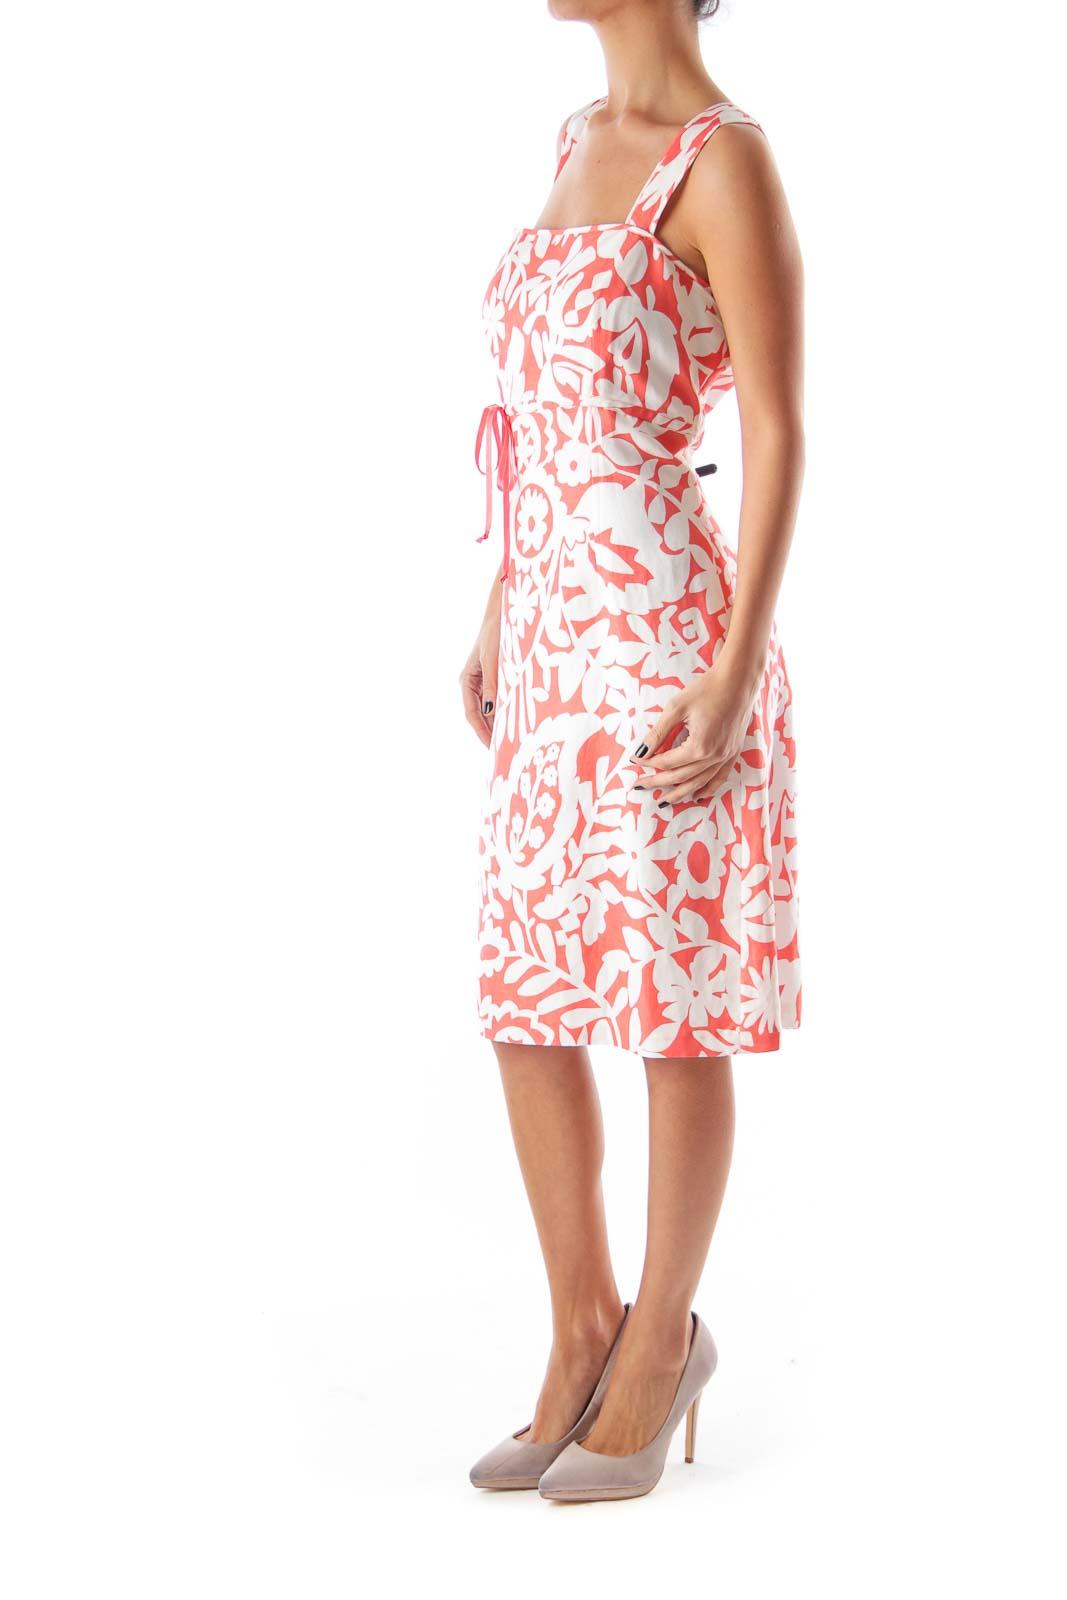 Orange Floral Print Dress